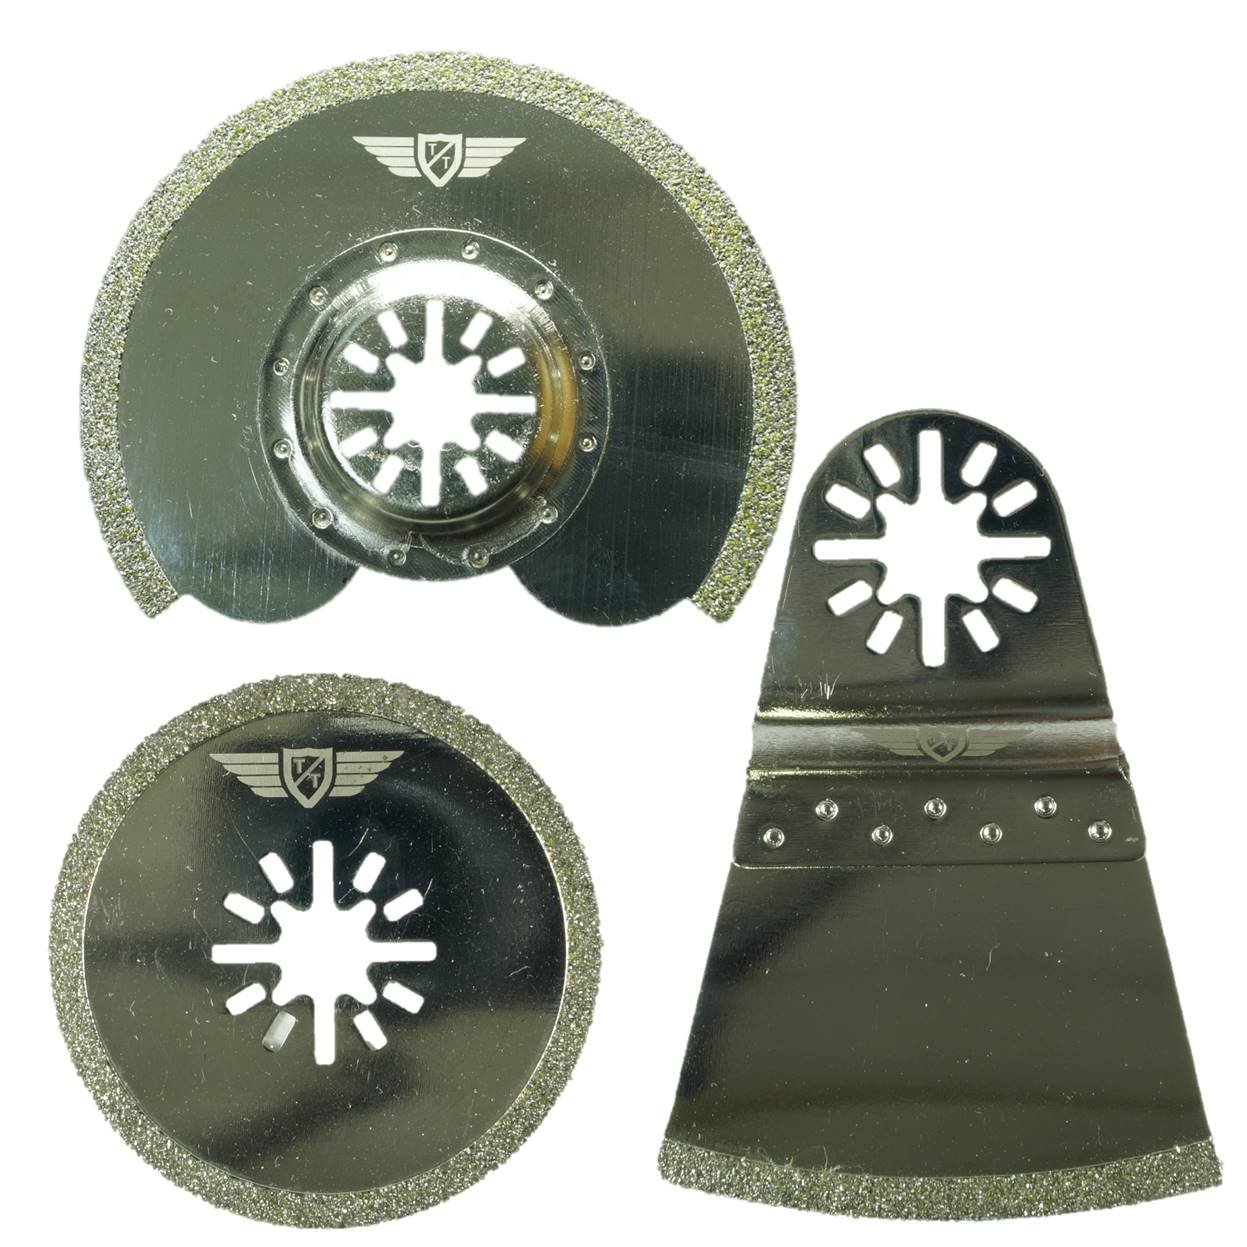 Makita Milwaukee Einhell Hitachi Parkside Ryobi Worx Workzone Multitool Outil multifonction Accessoires Pas StarLock 3 x TopsTools UNK3DB Diamant Lames de joint pour Bosch Fein